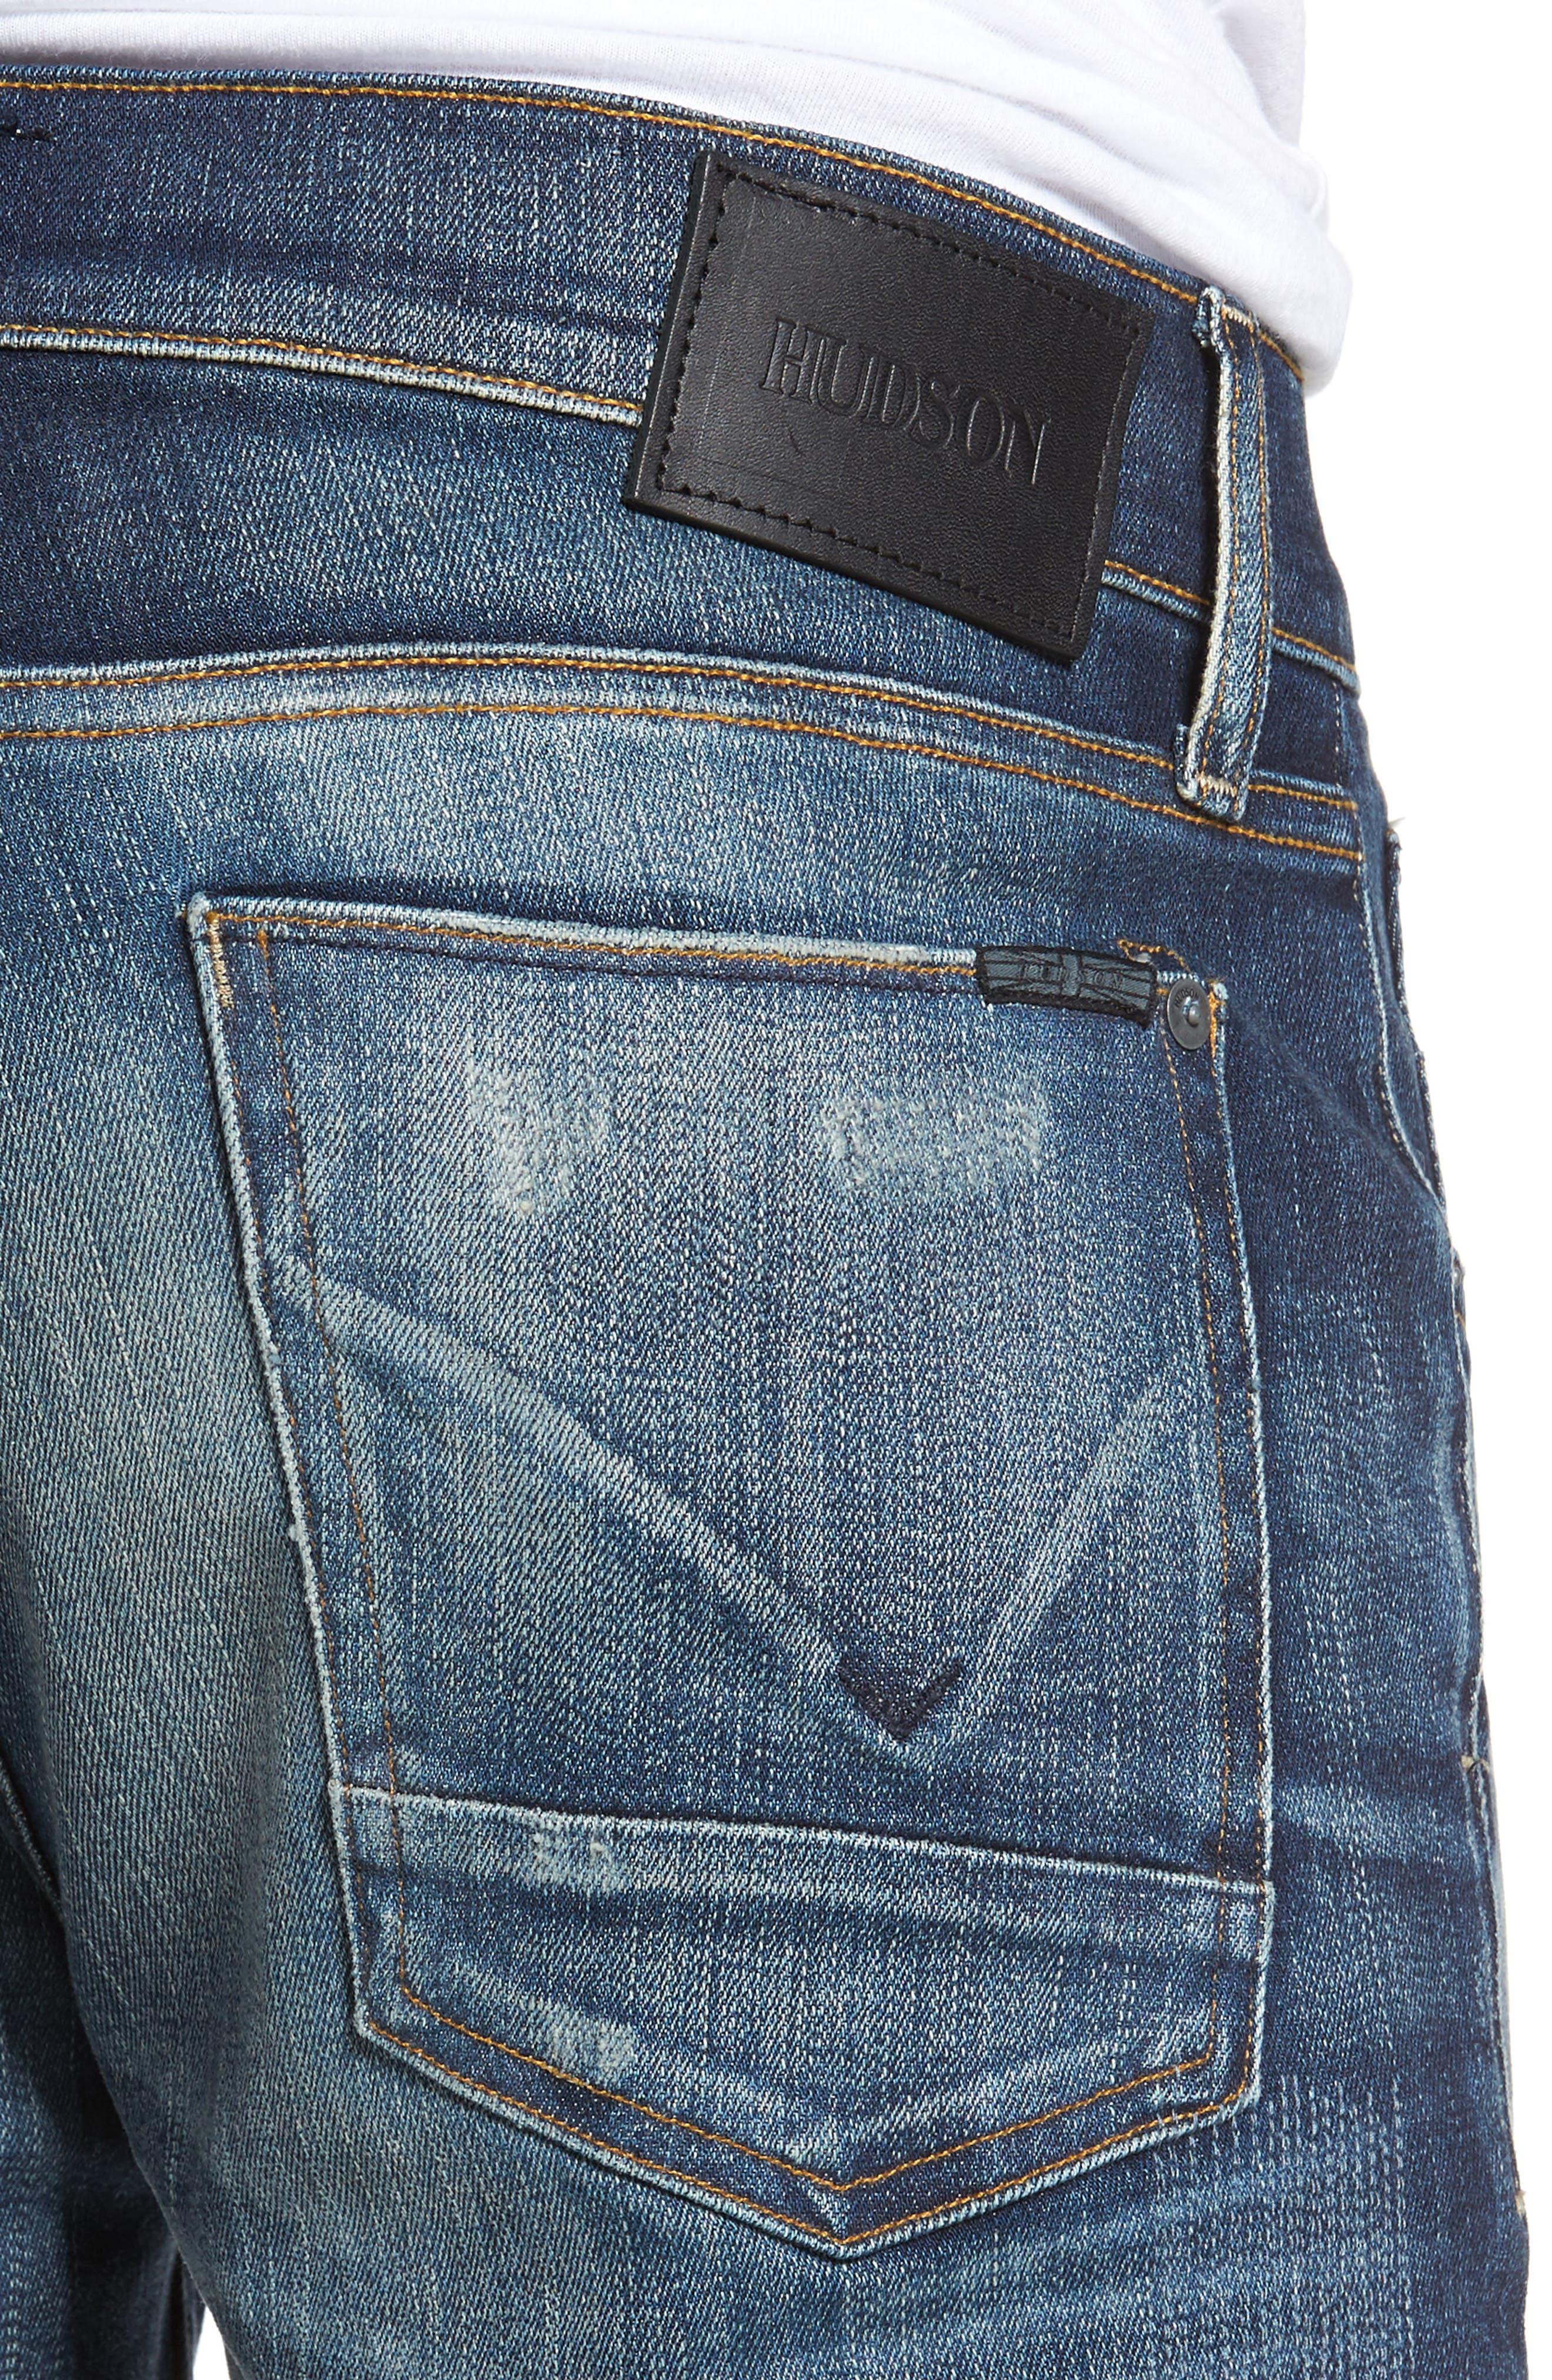 Hudson Blake Slim Fit Jeans,                             Alternate thumbnail 4, color,                             Ban This